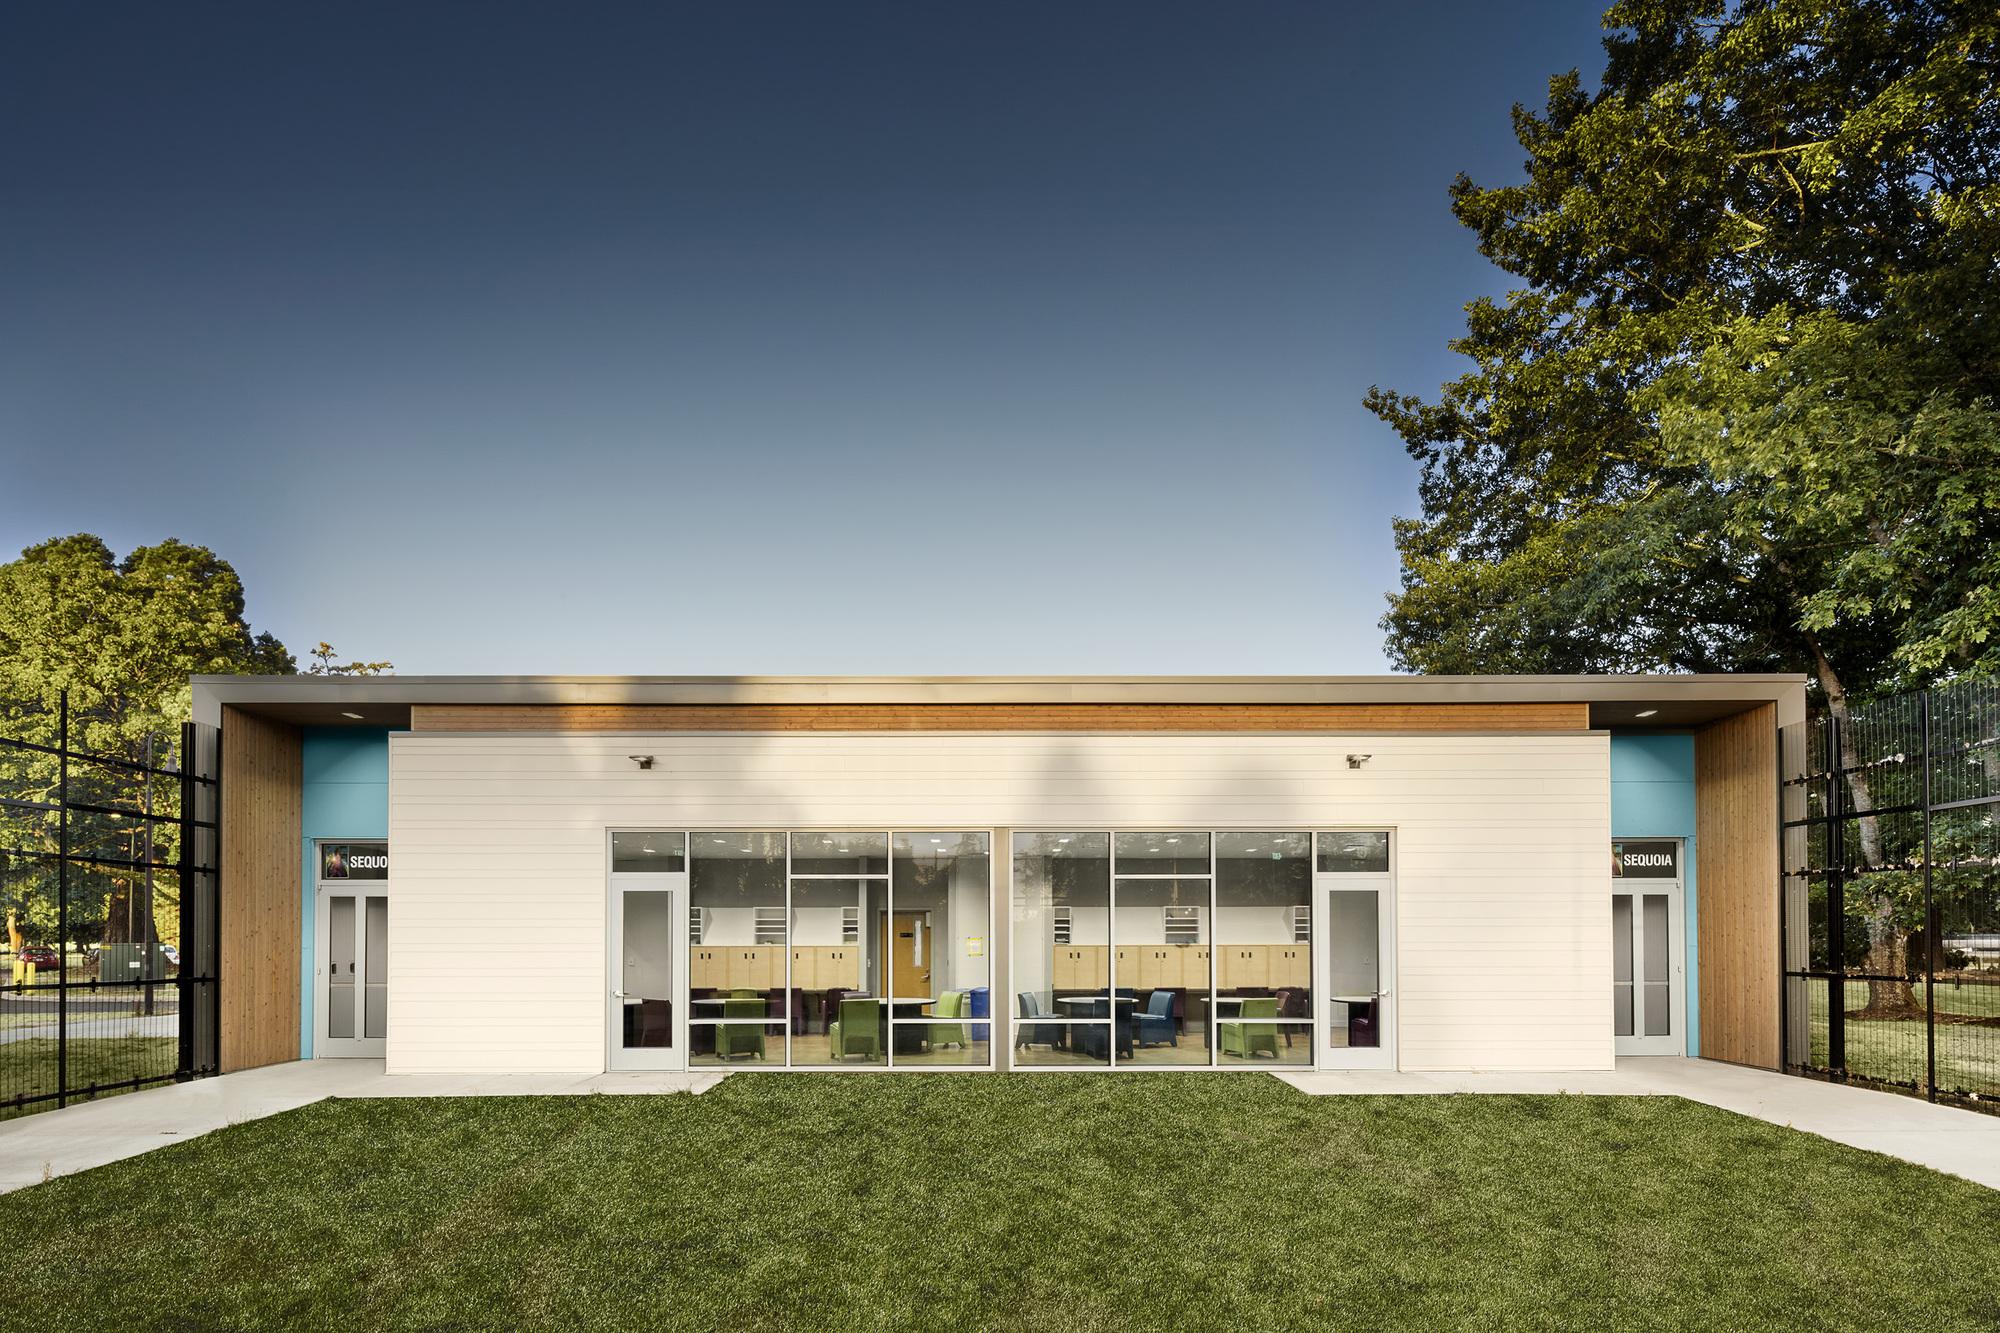 Trillium Secure Adolescent Inpatient Facility / TVA Architects, © Charles  Chestnut